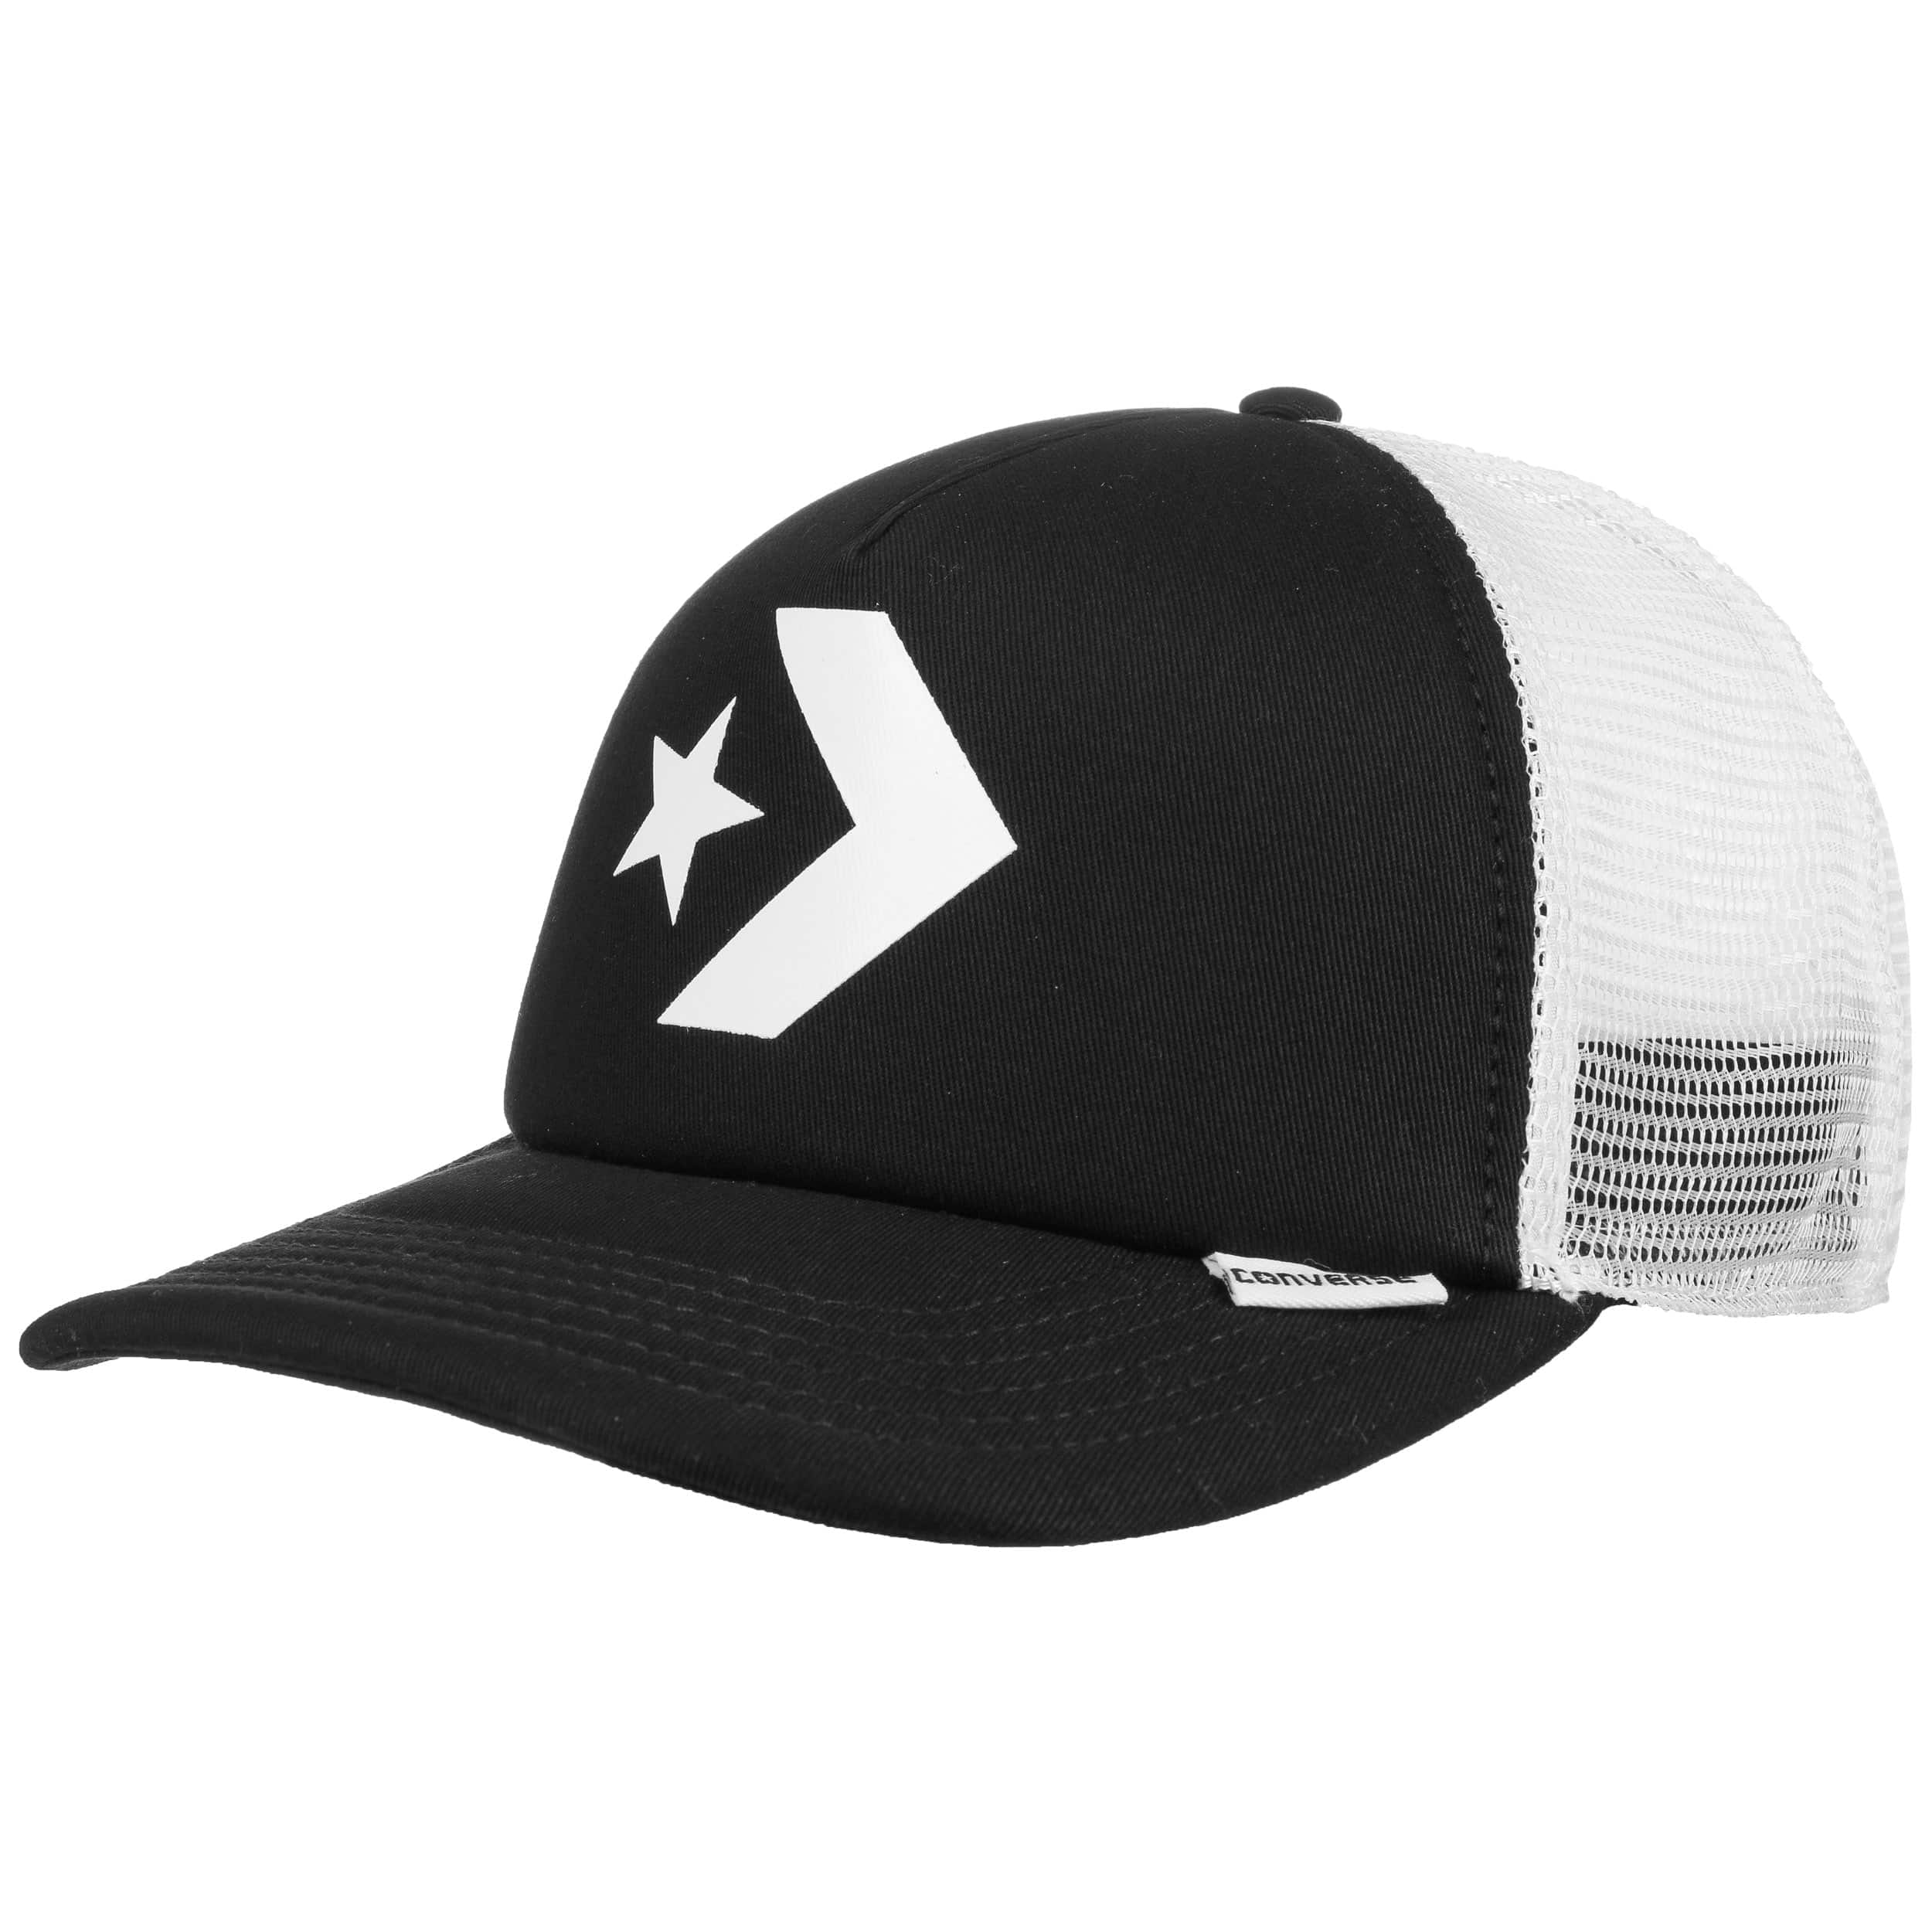 Cappellino Star Trucker by Converse 19,95 €